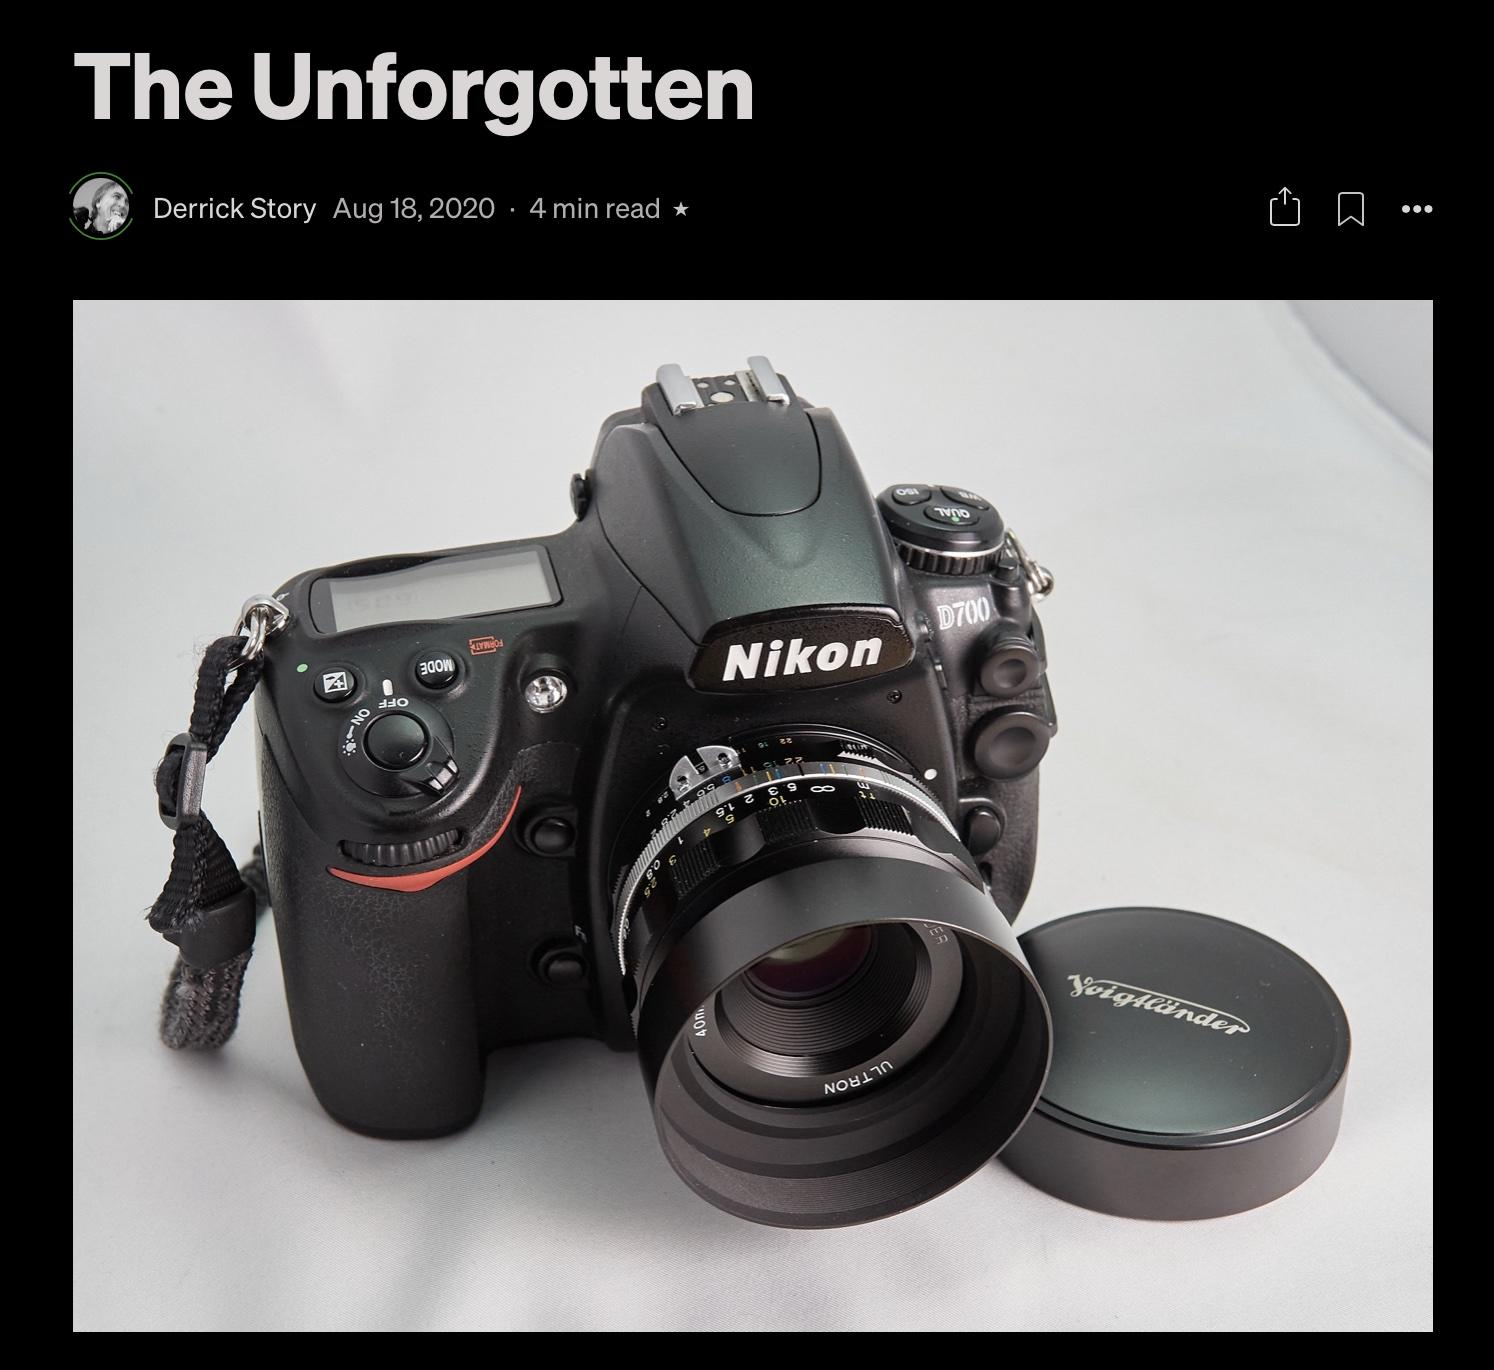 https://thedigitalstory.com/2021/06/the-unforgotten.jpg